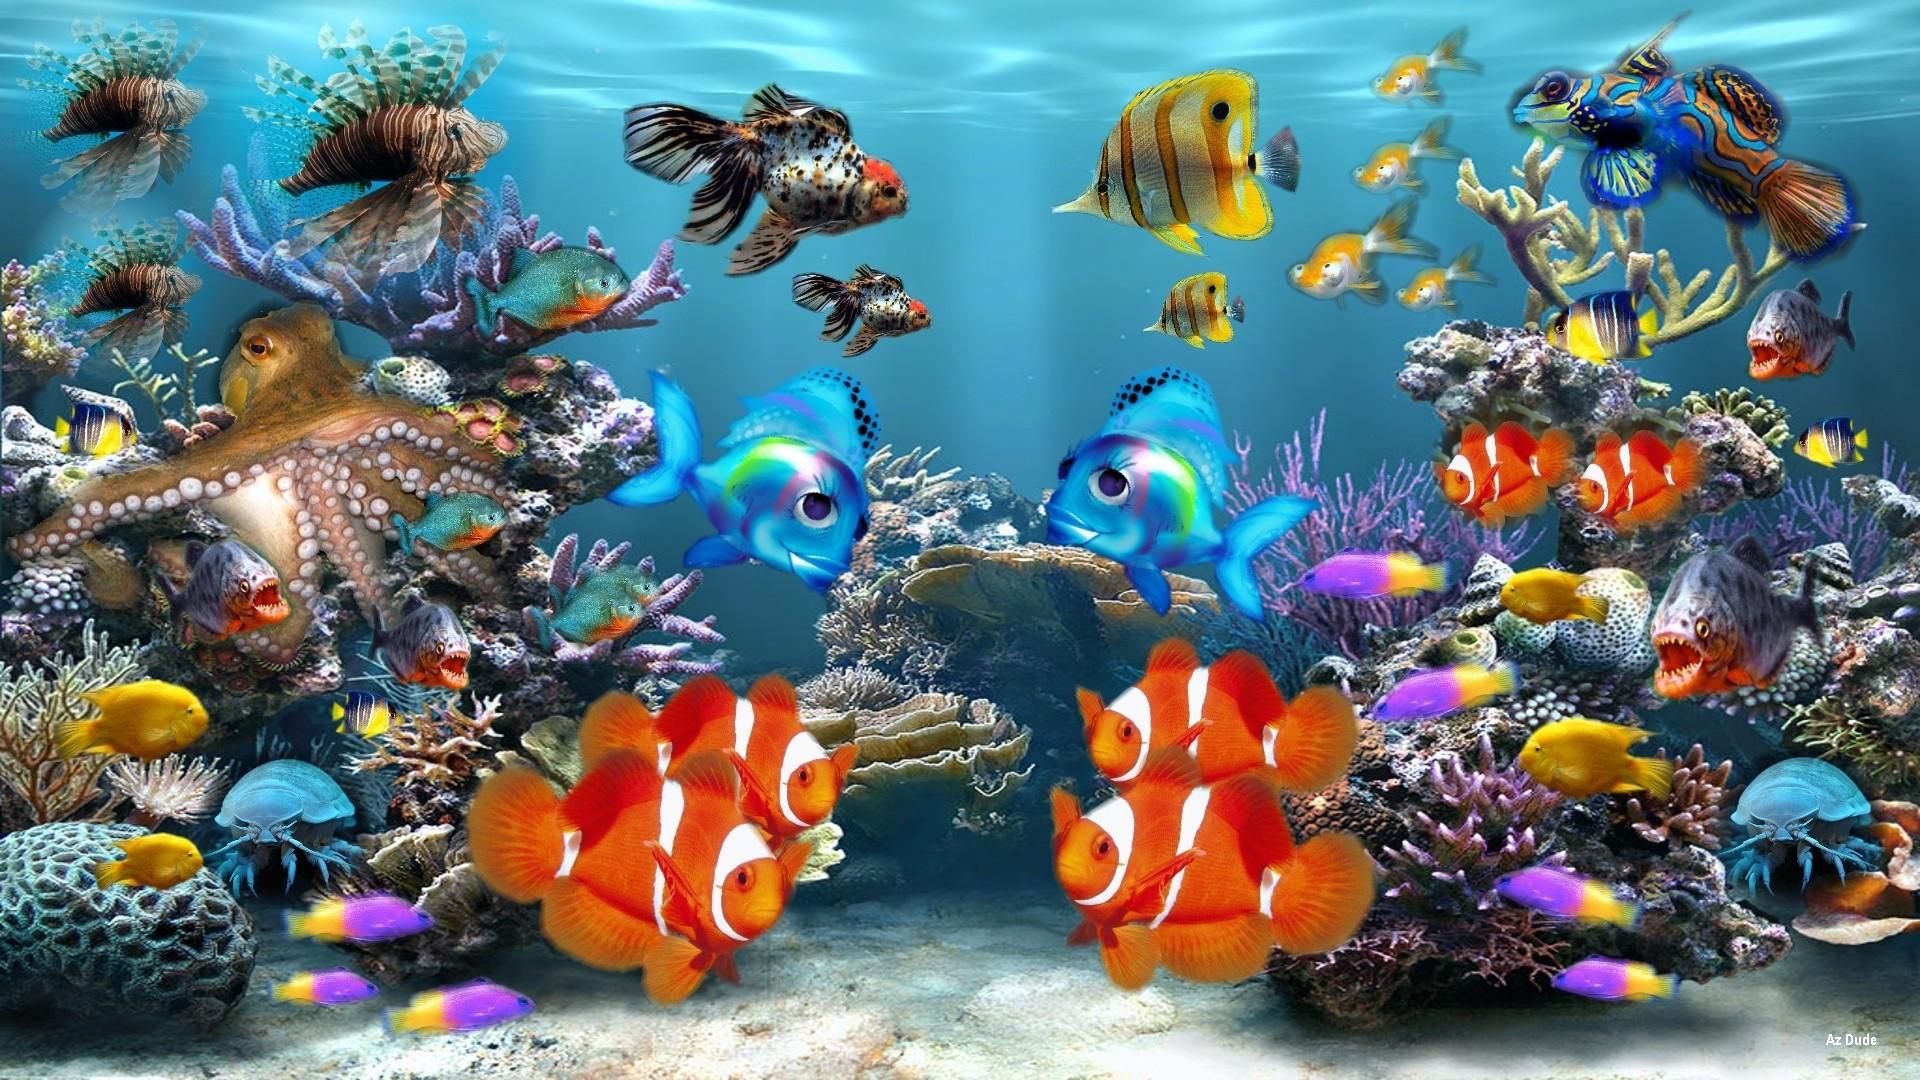 15+ Aquarium Live Wallpaper for PC